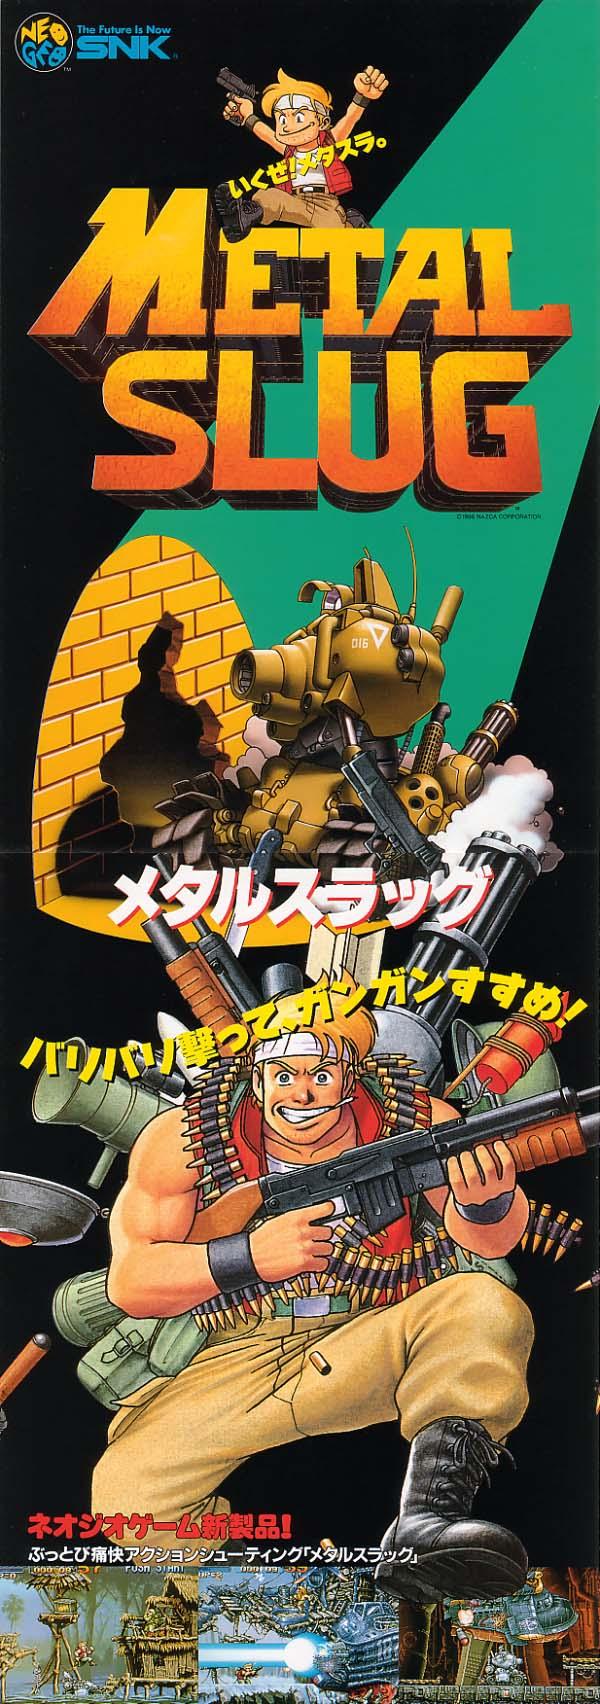 The Arcade Flyer Archive - Video Game Flyers: Metal Slug, Nazca Corp.